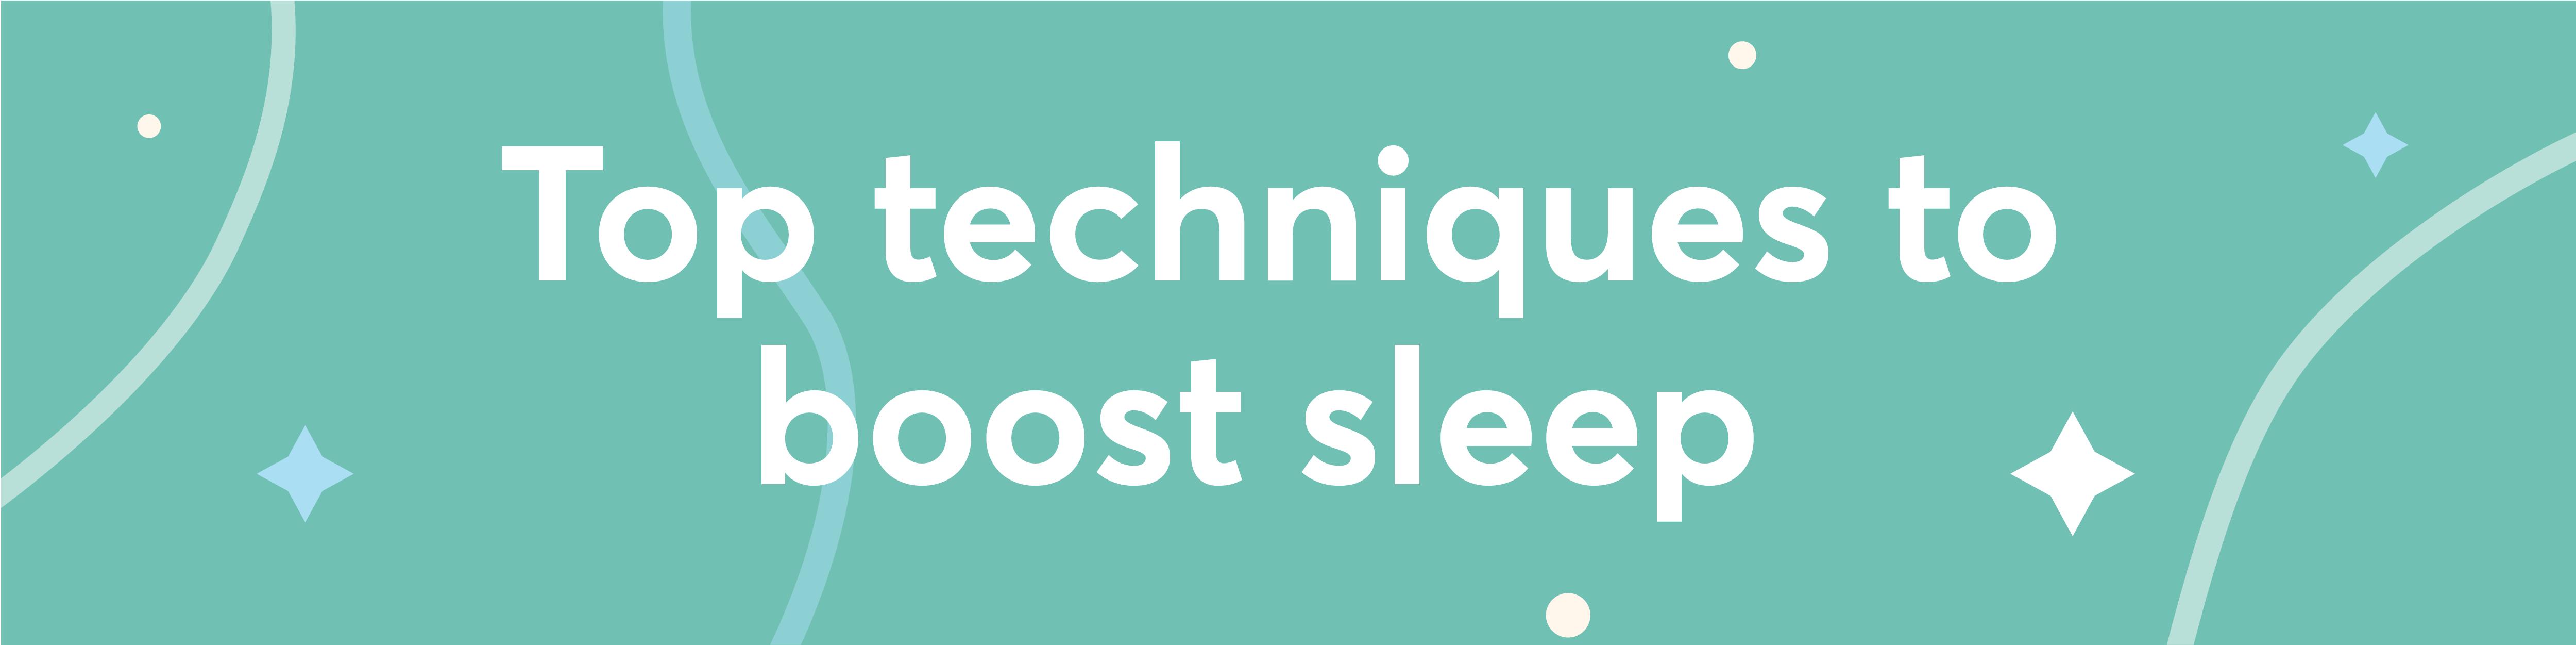 Shleep: Top techniques to boost sleep